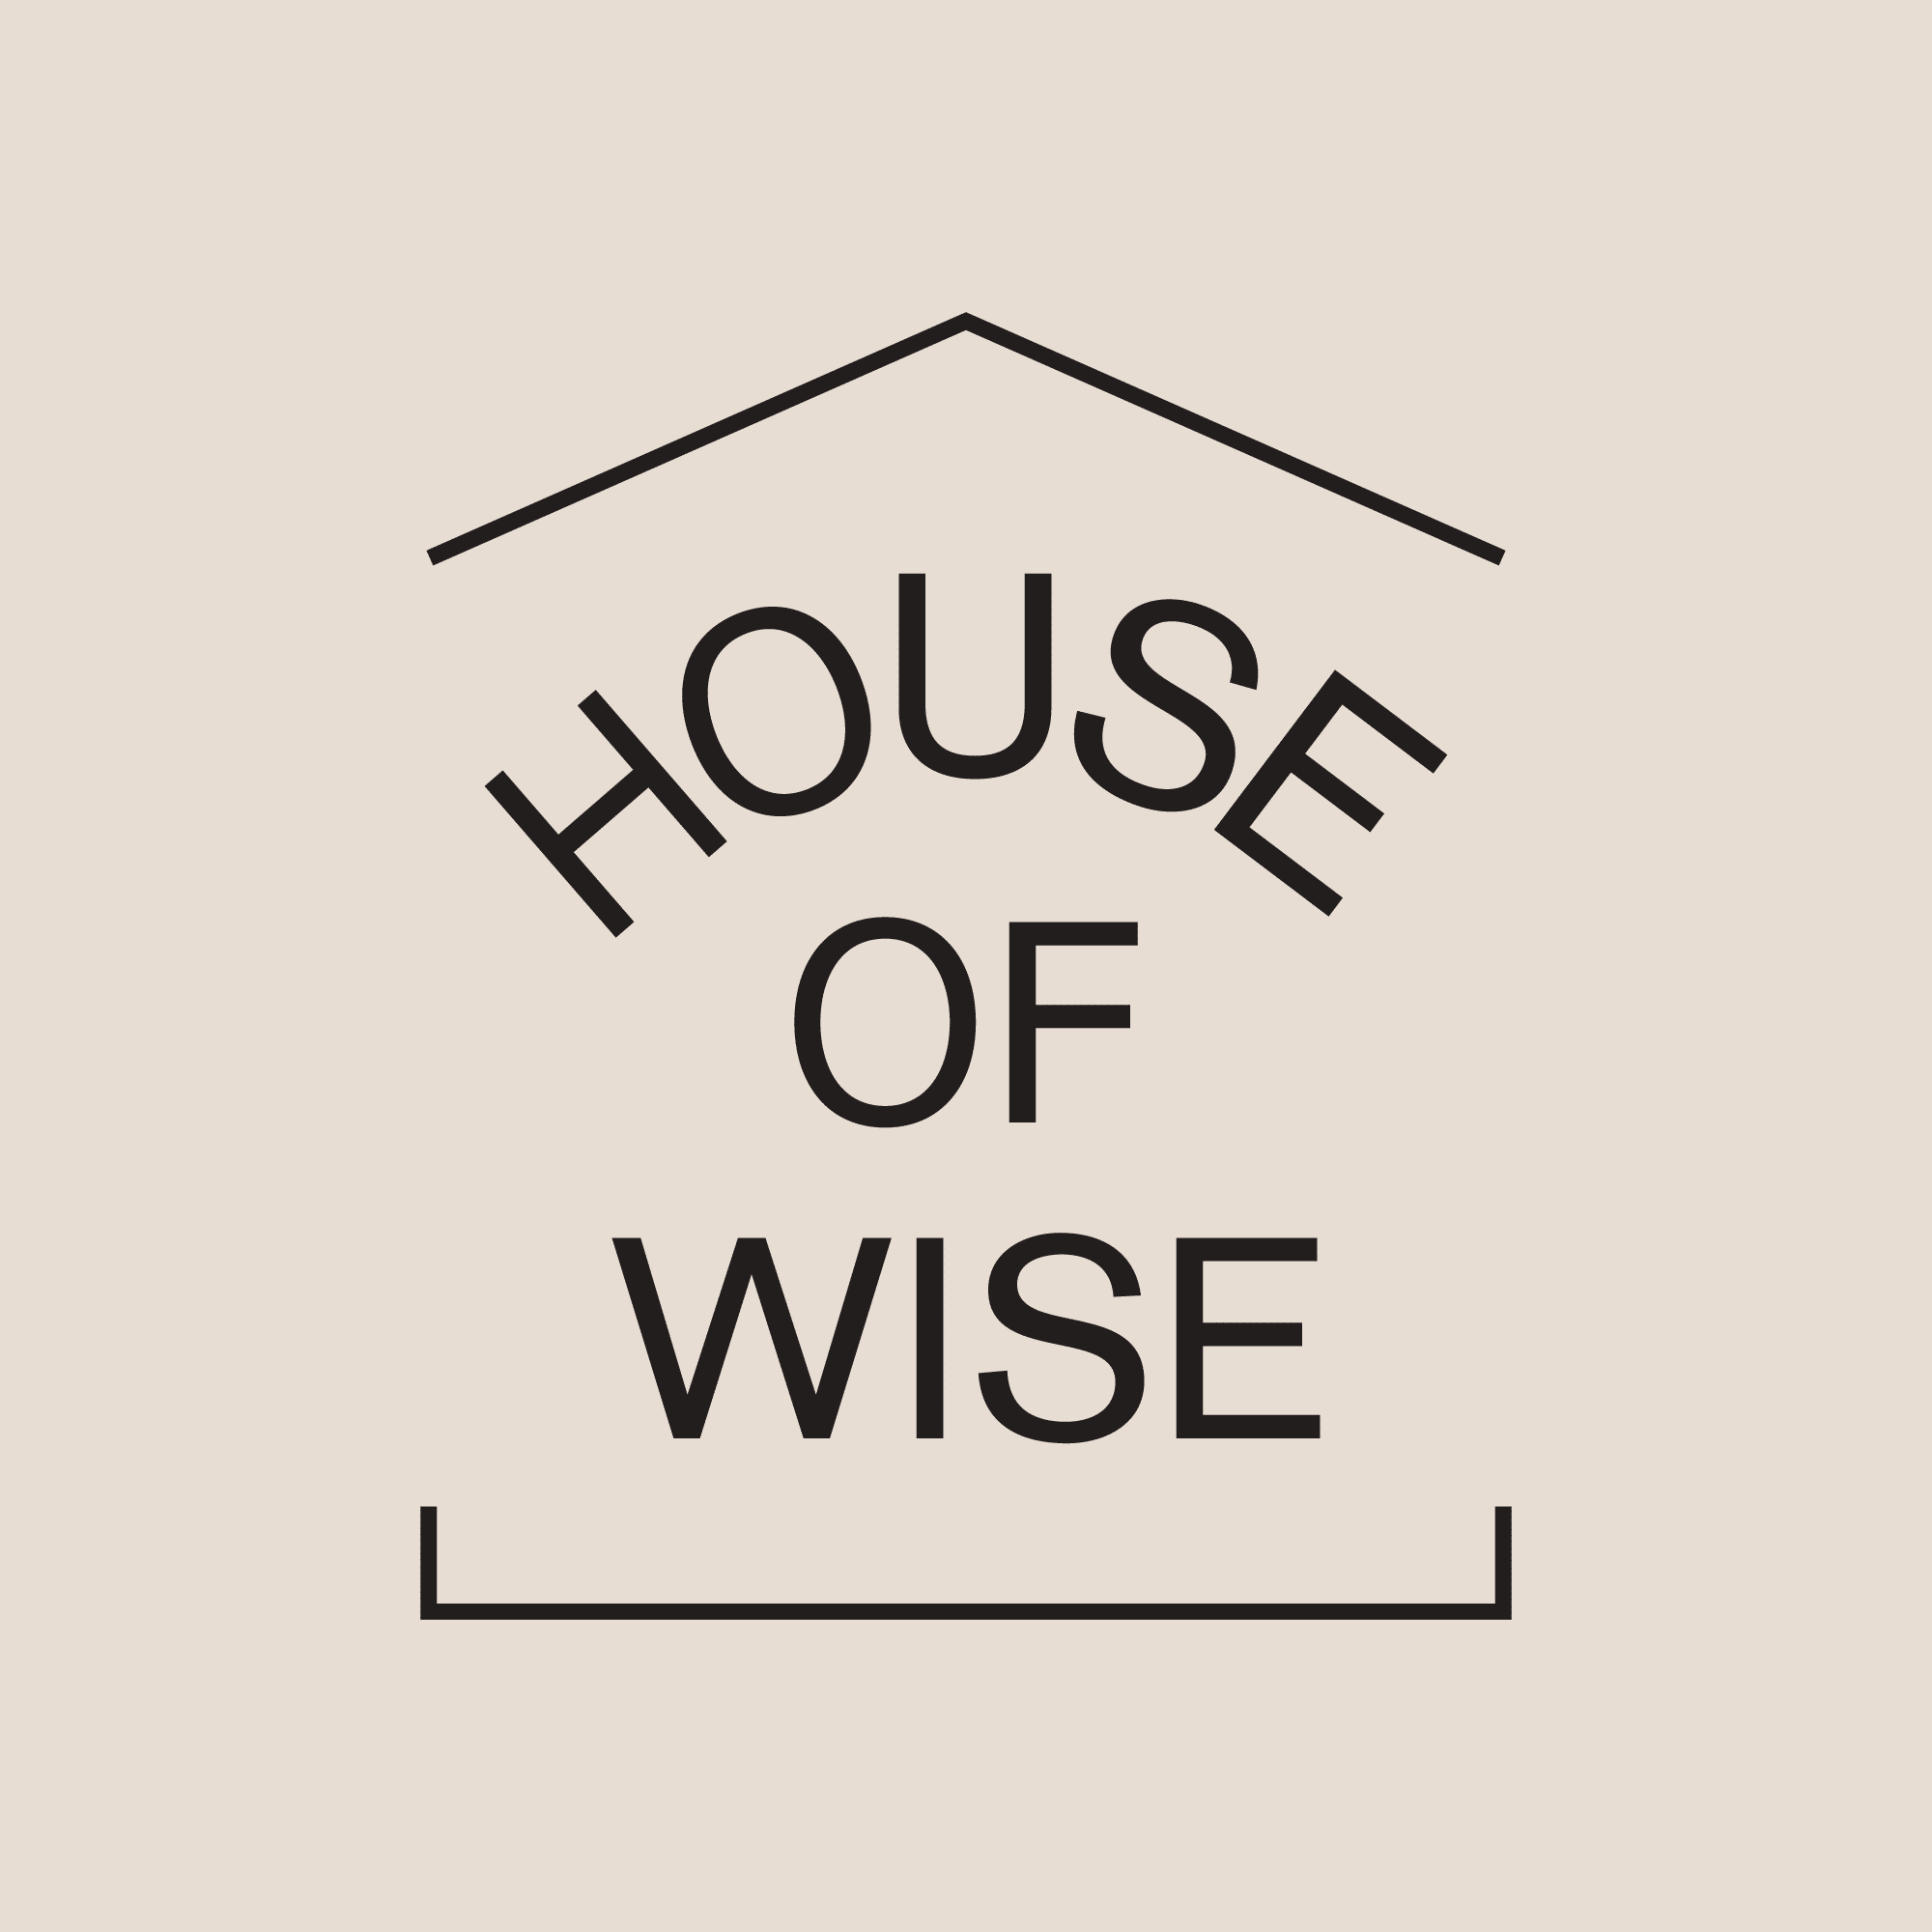 houseofwise